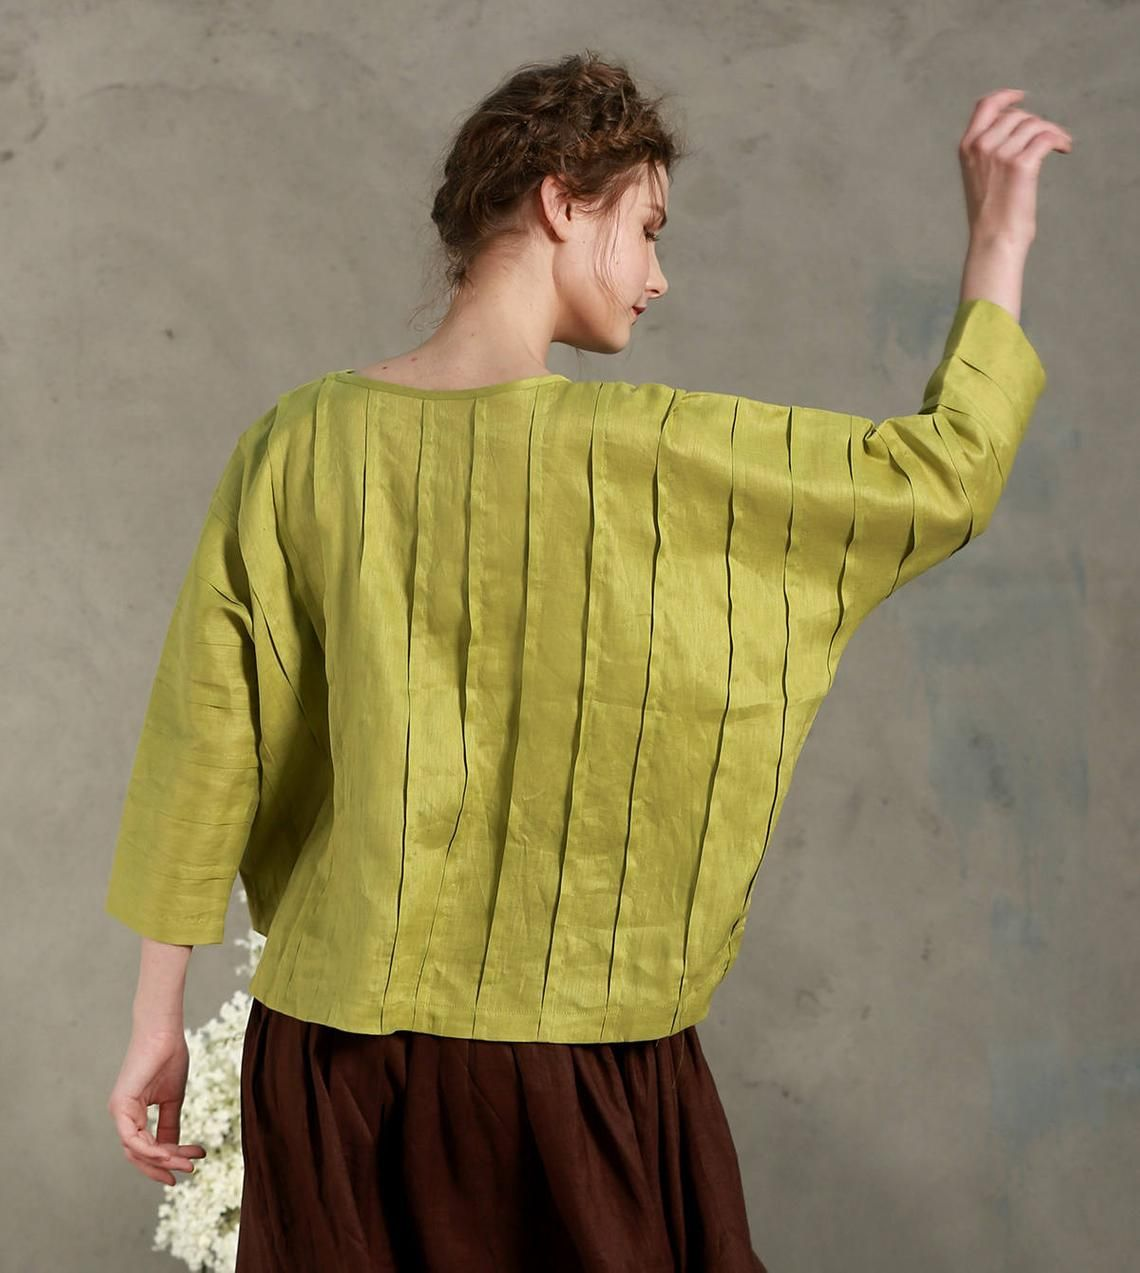 newest aa444 dd096 Leinen Tunika-Shirt in Orange, Pintucked-Hemd-Bluse, Plissee ...